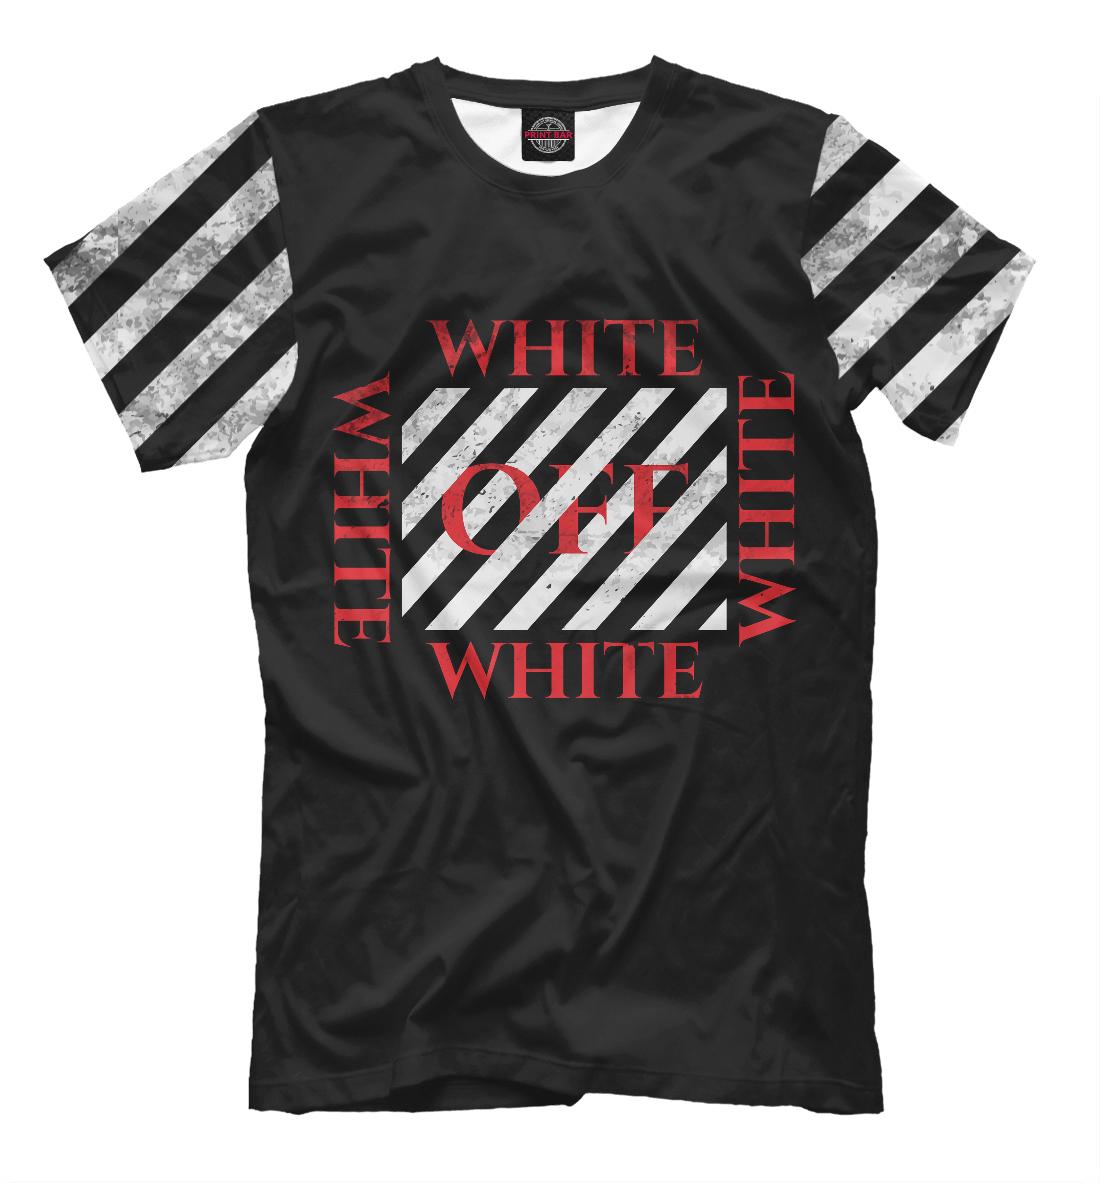 Купить Off-White GG Style, Printbar, Футболки, APD-461144-fut-2